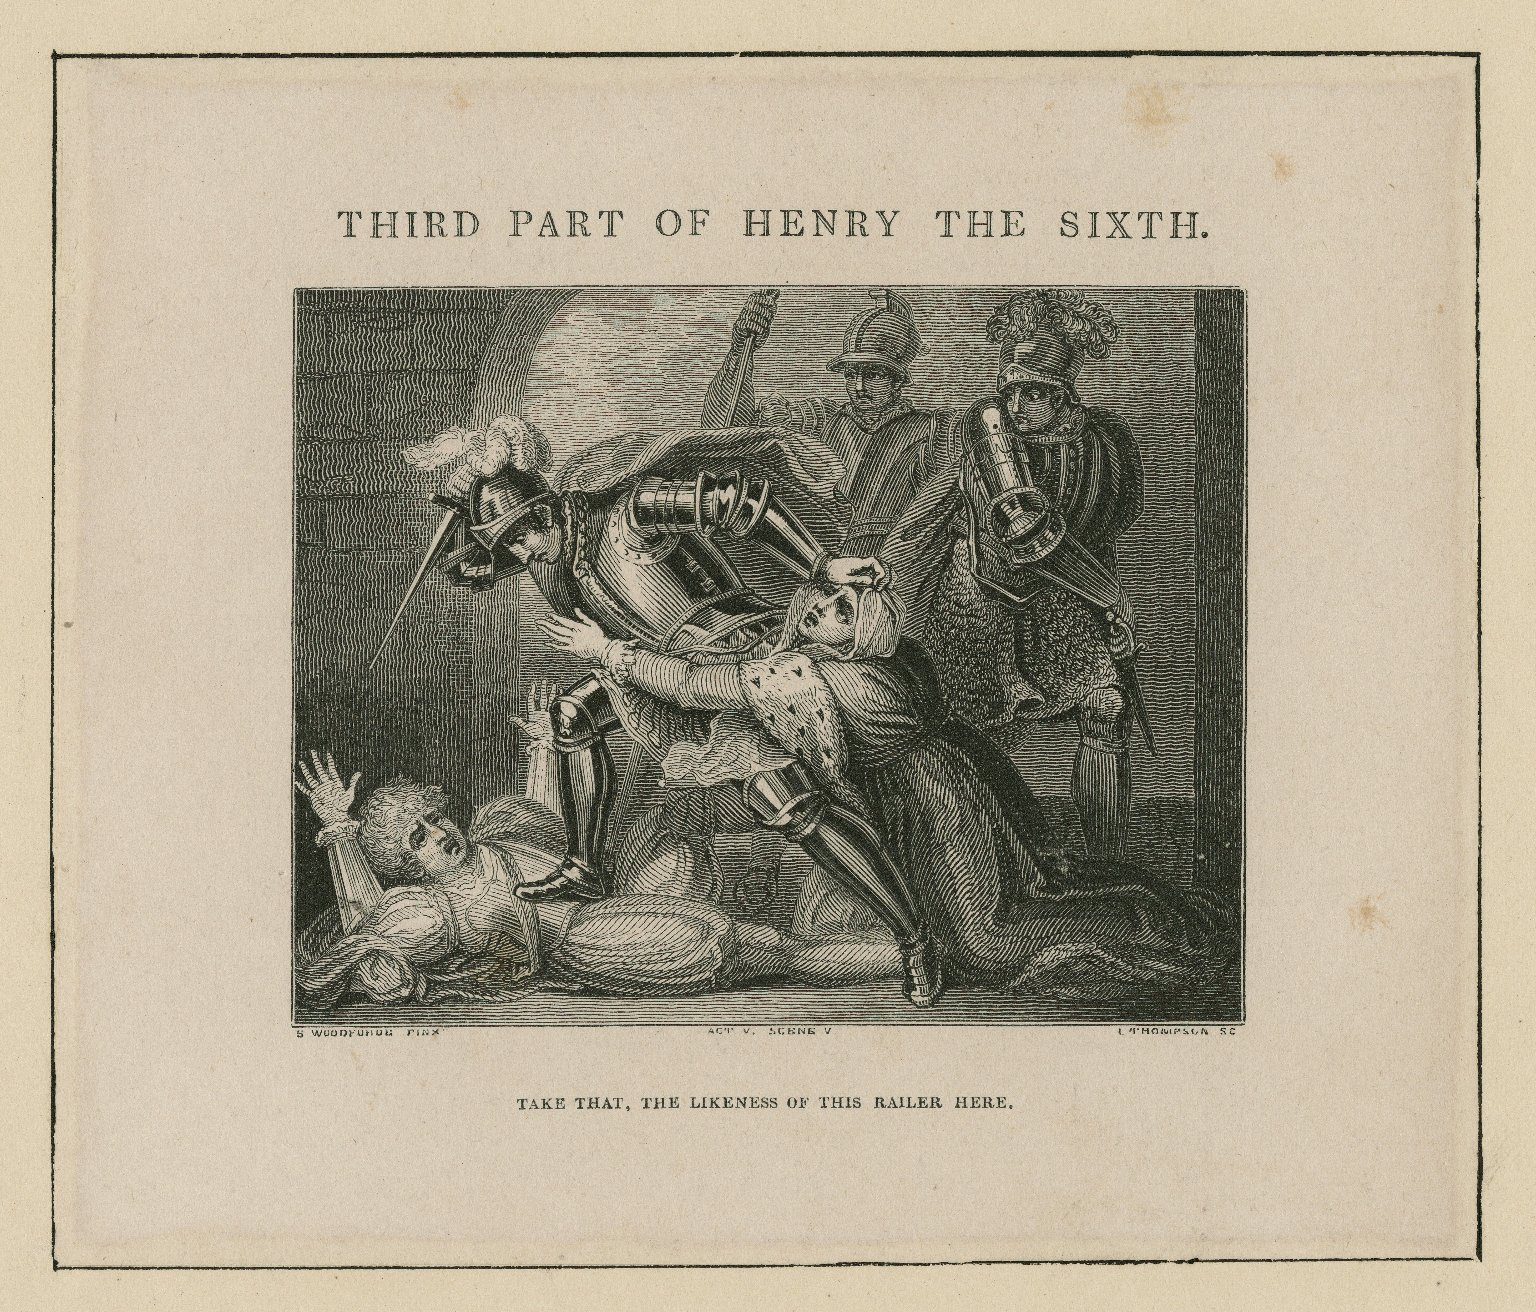 Third part of Henry the Sixth, Act V, scene v [graphic] / S. Woodforde pinx. ; I. Thompson sc.